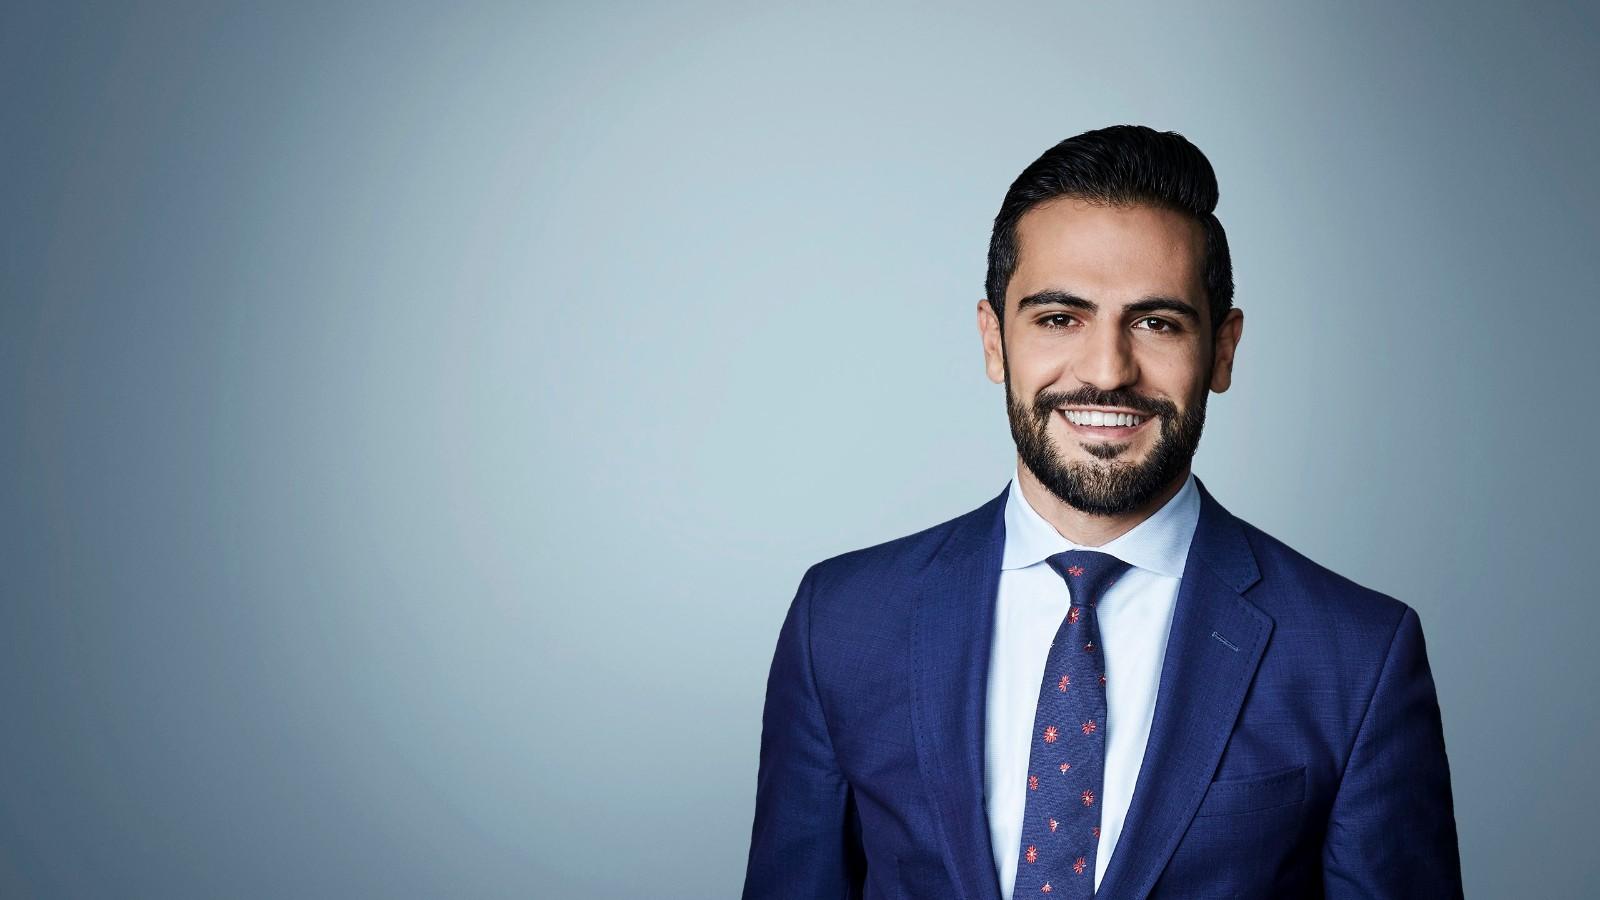 Cnn Profiles Jeremy Diamond White House Reporter Cnn